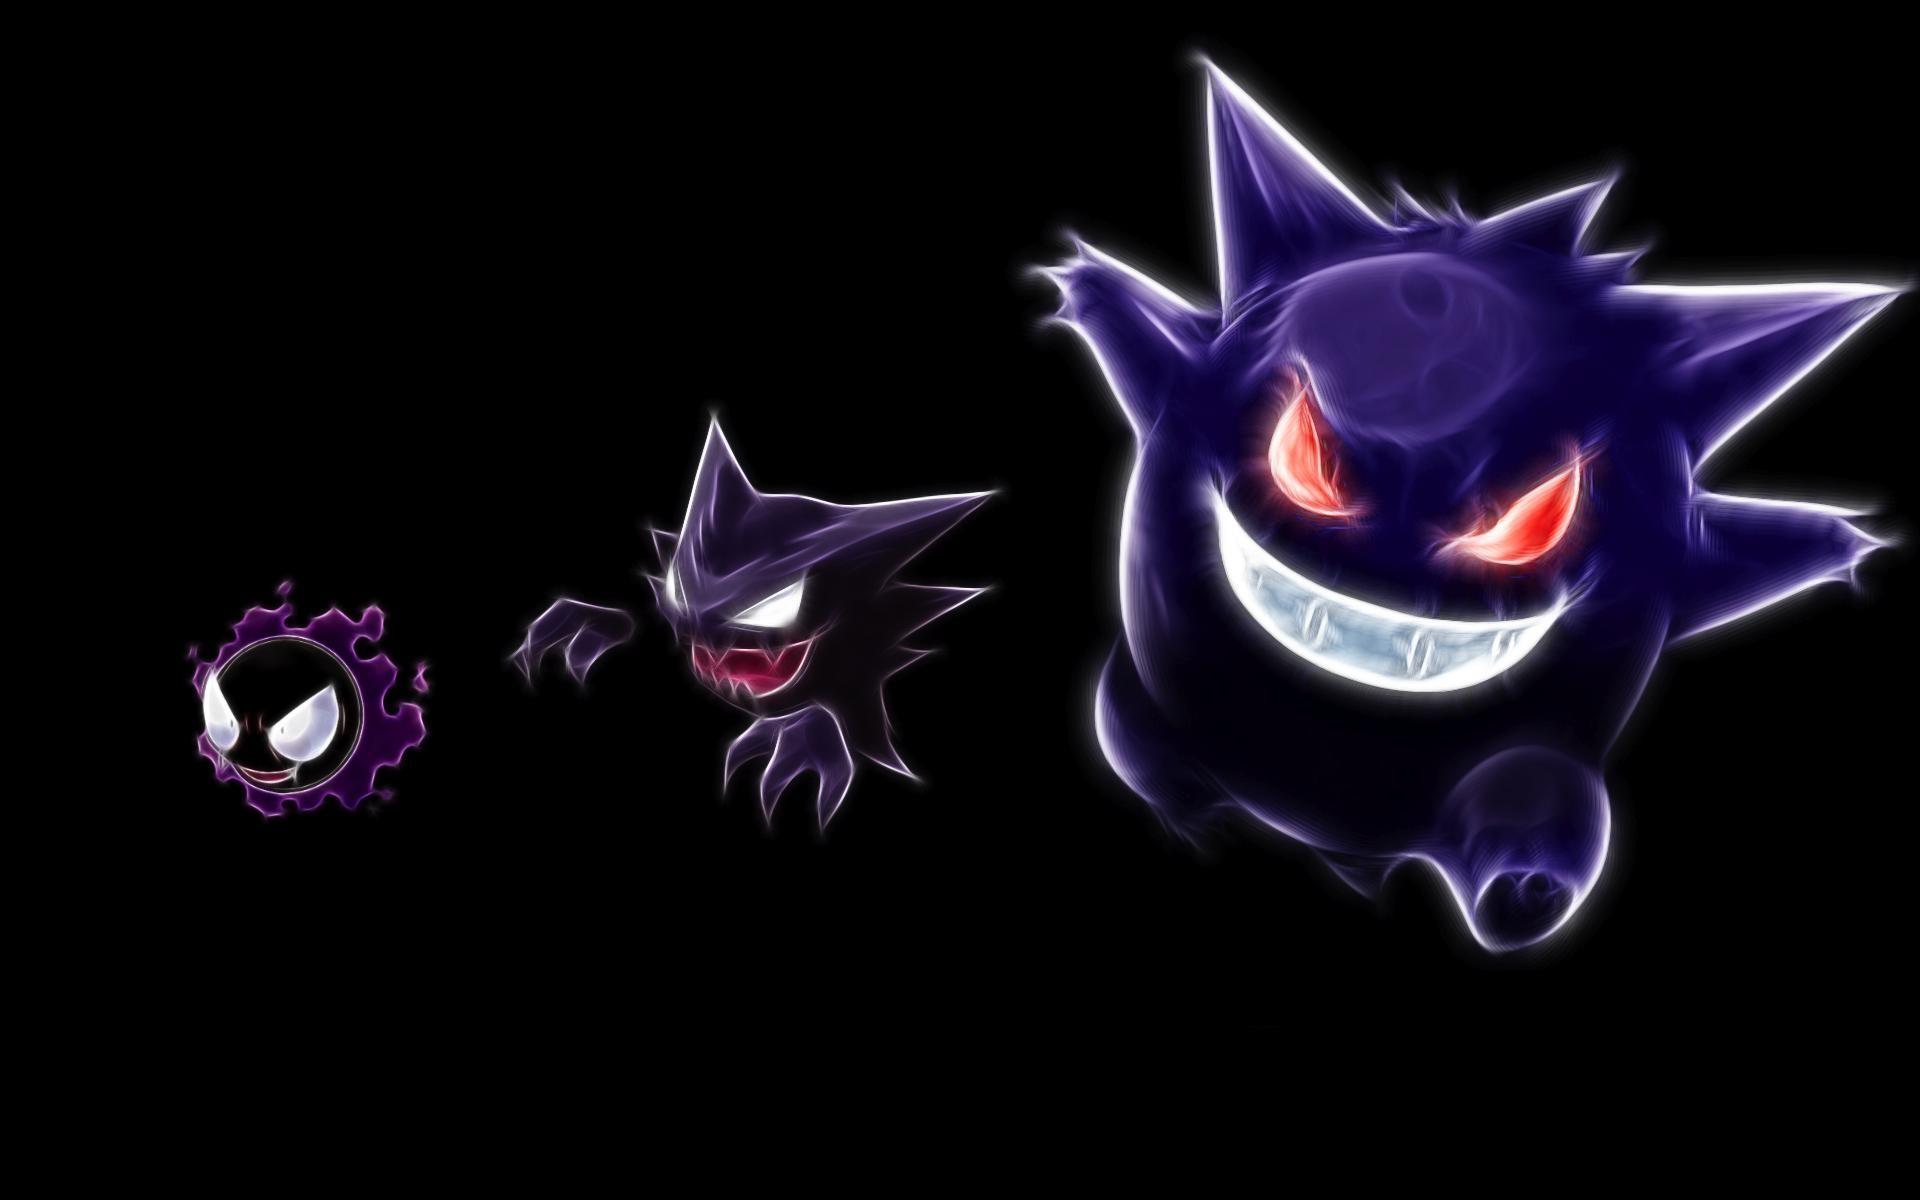 Download Pokemon Wallpaper | Full HD Wallpapers